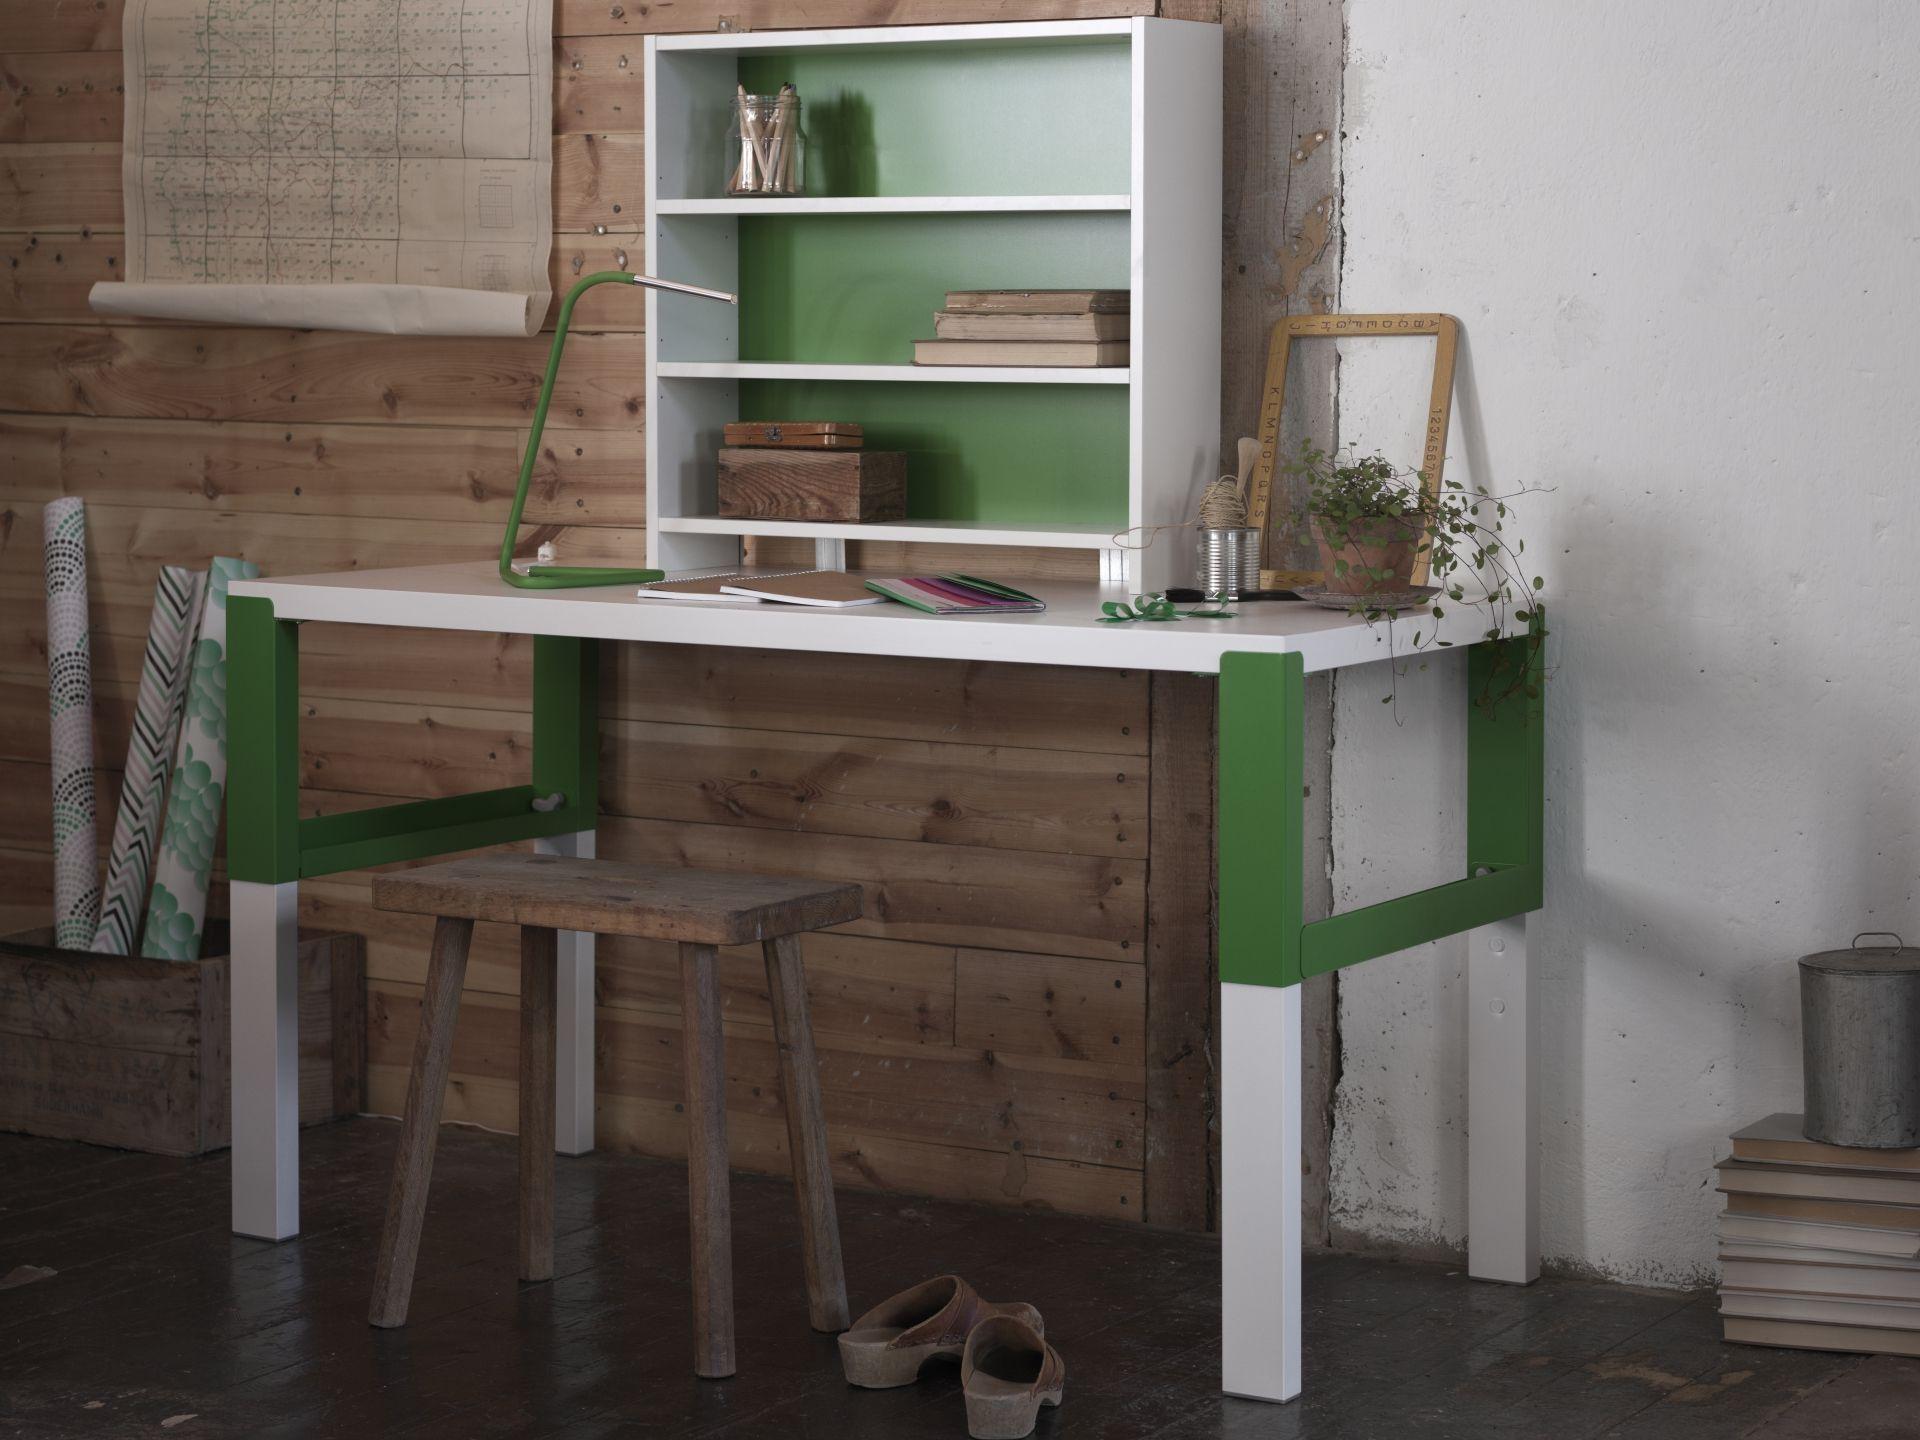 PÅhl bureau met open kastje wit groen pinterest bureaus ikea